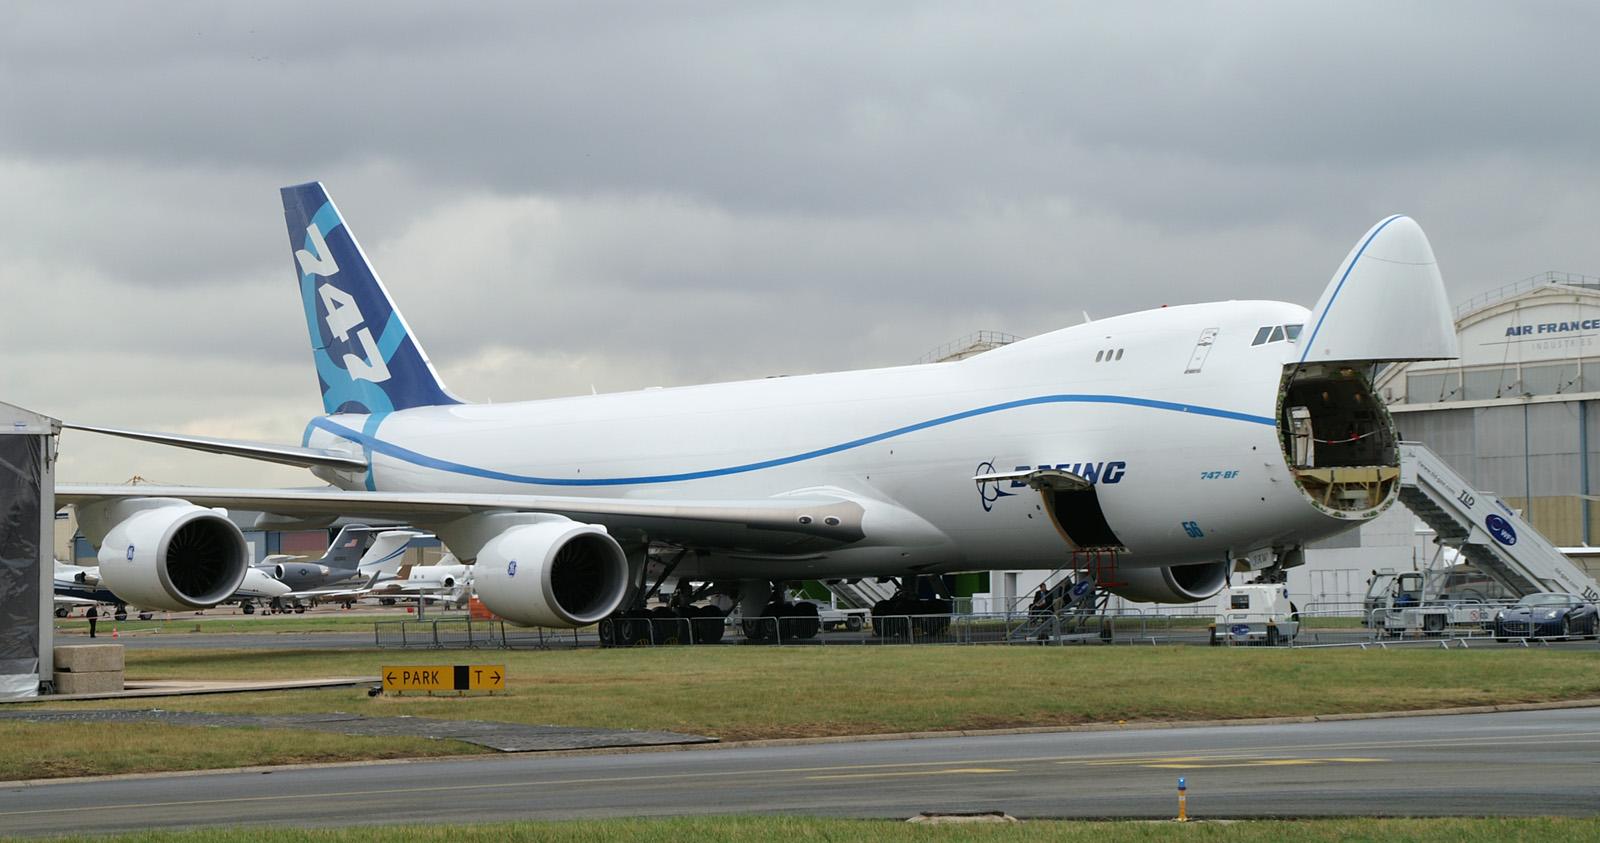 http://3.bp.blogspot.com/-twhMoNO43RY/T9XrjB6cgeI/AAAAAAAAJQs/TdMdvGekzJA/s1600/boeing_747-8_freighter.jpg